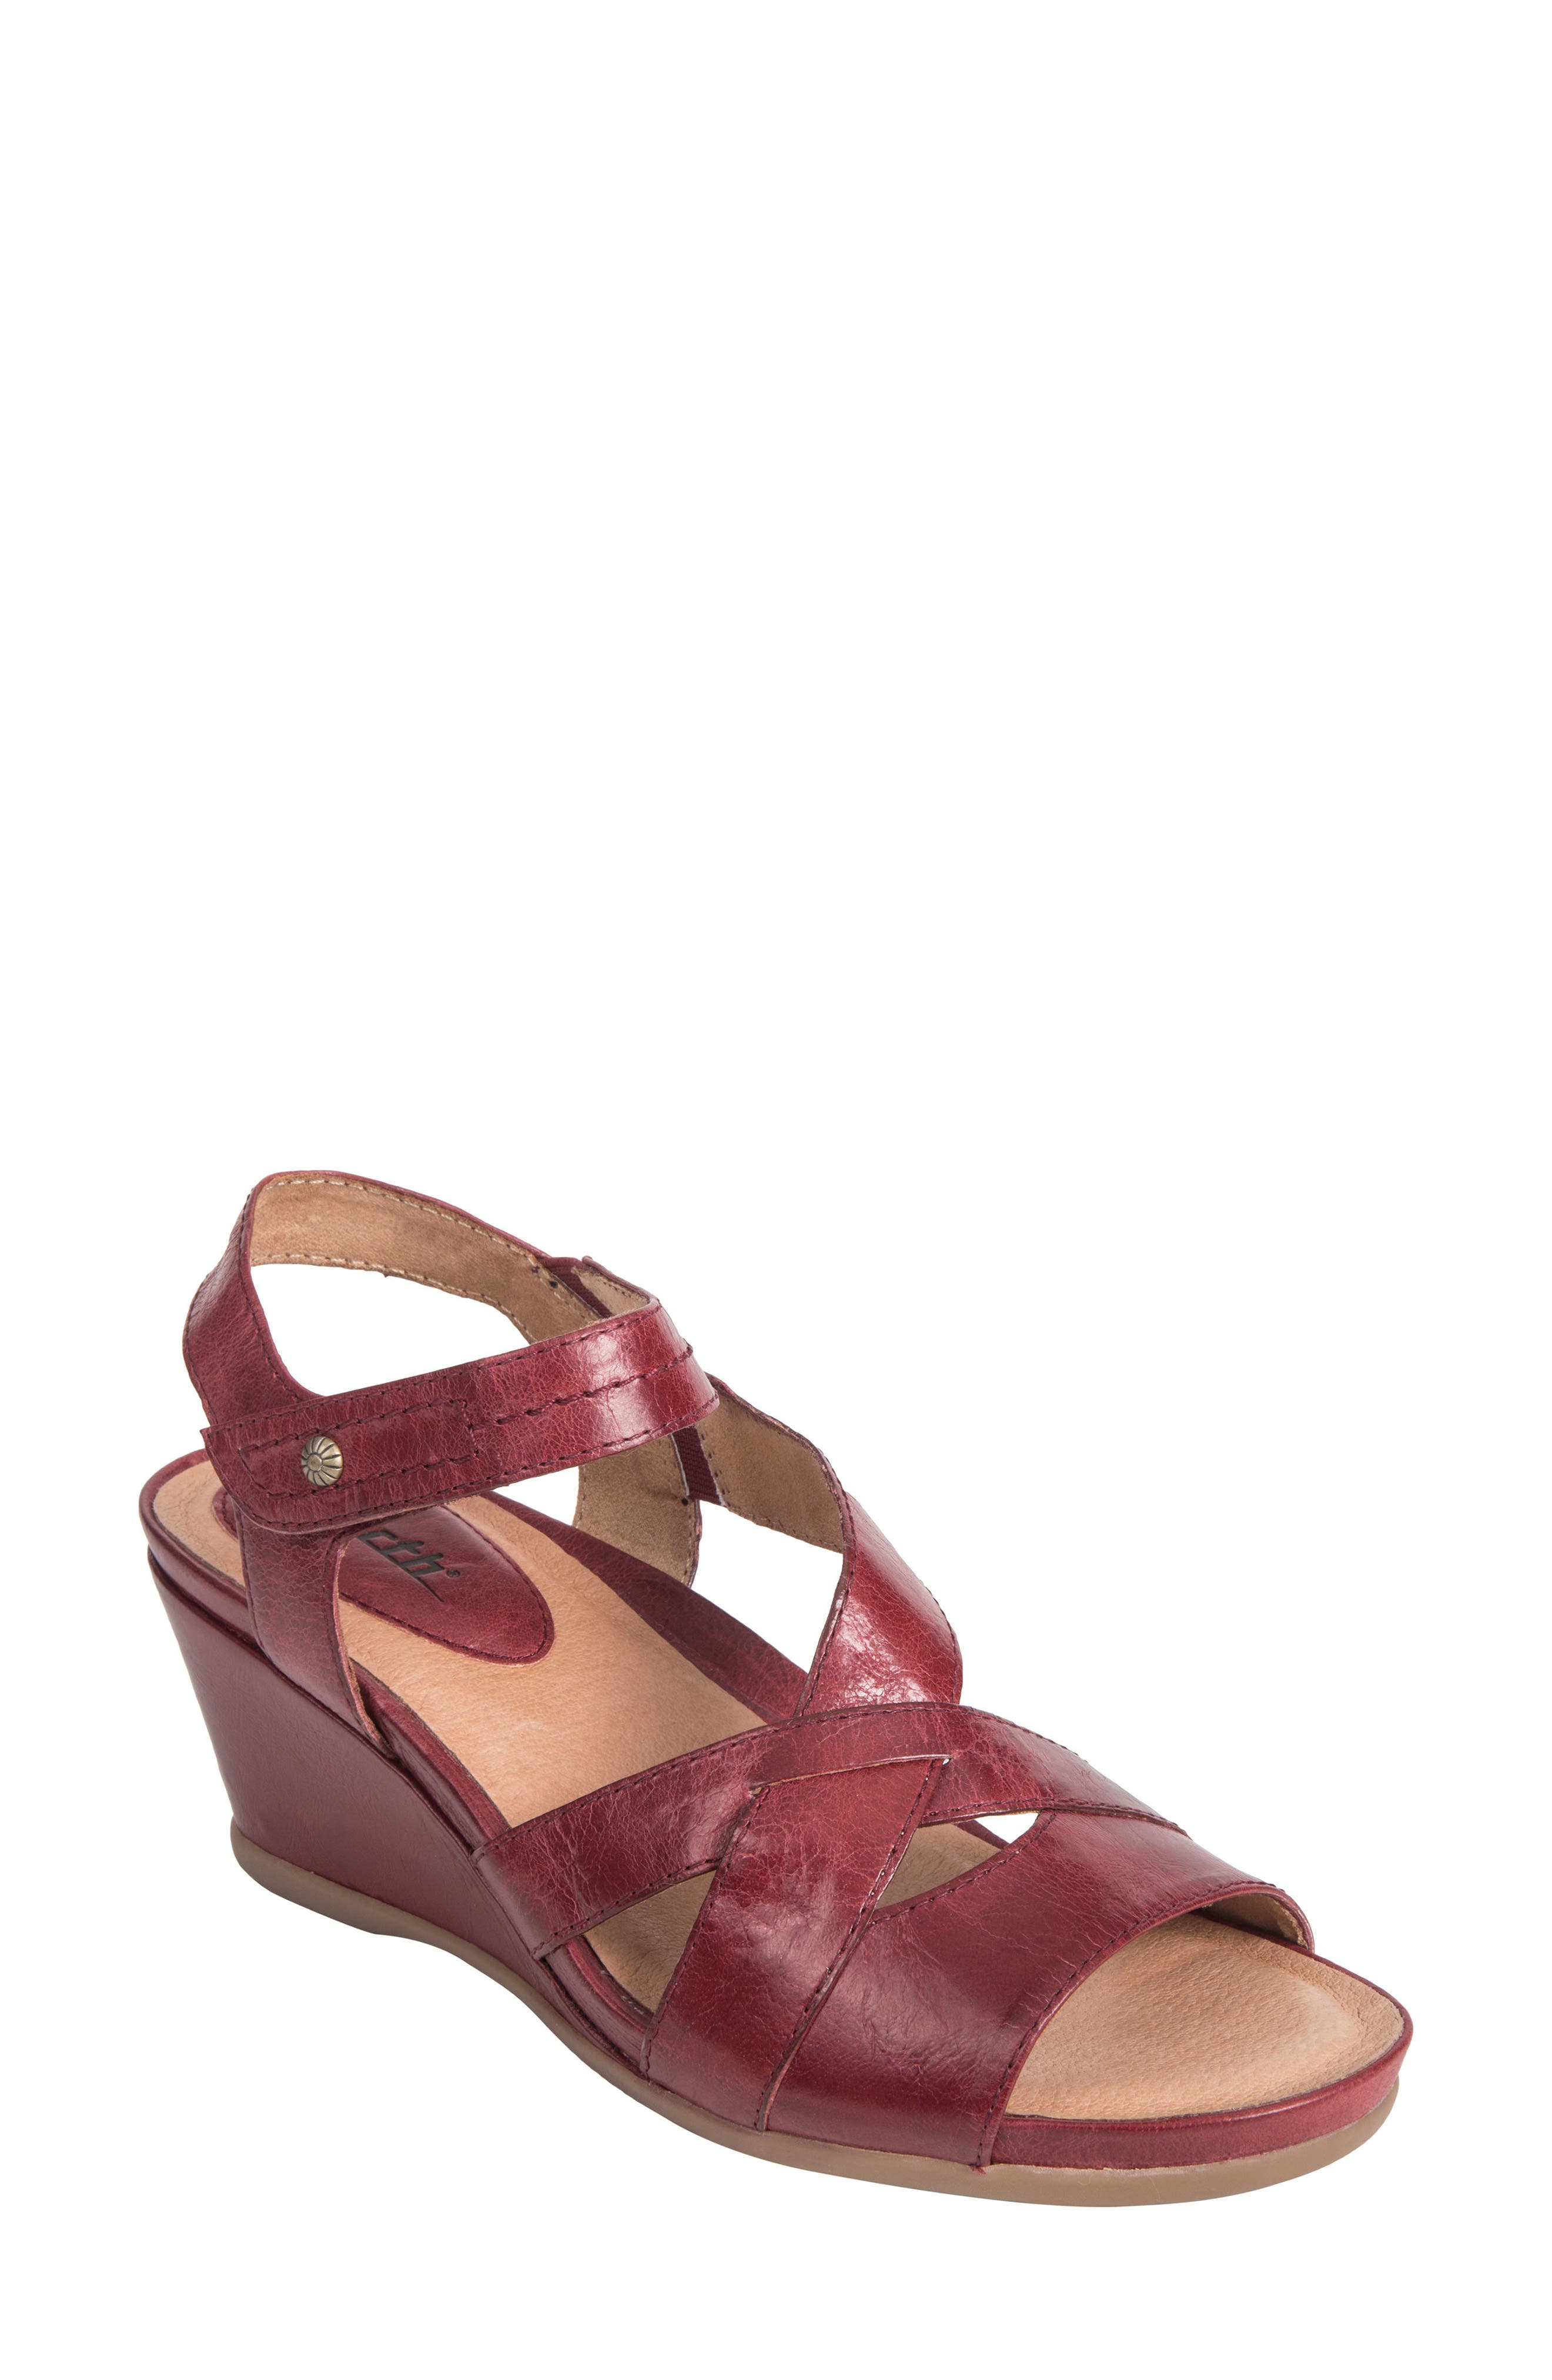 Thistle Wedge Sandal,                             Main thumbnail 3, color,